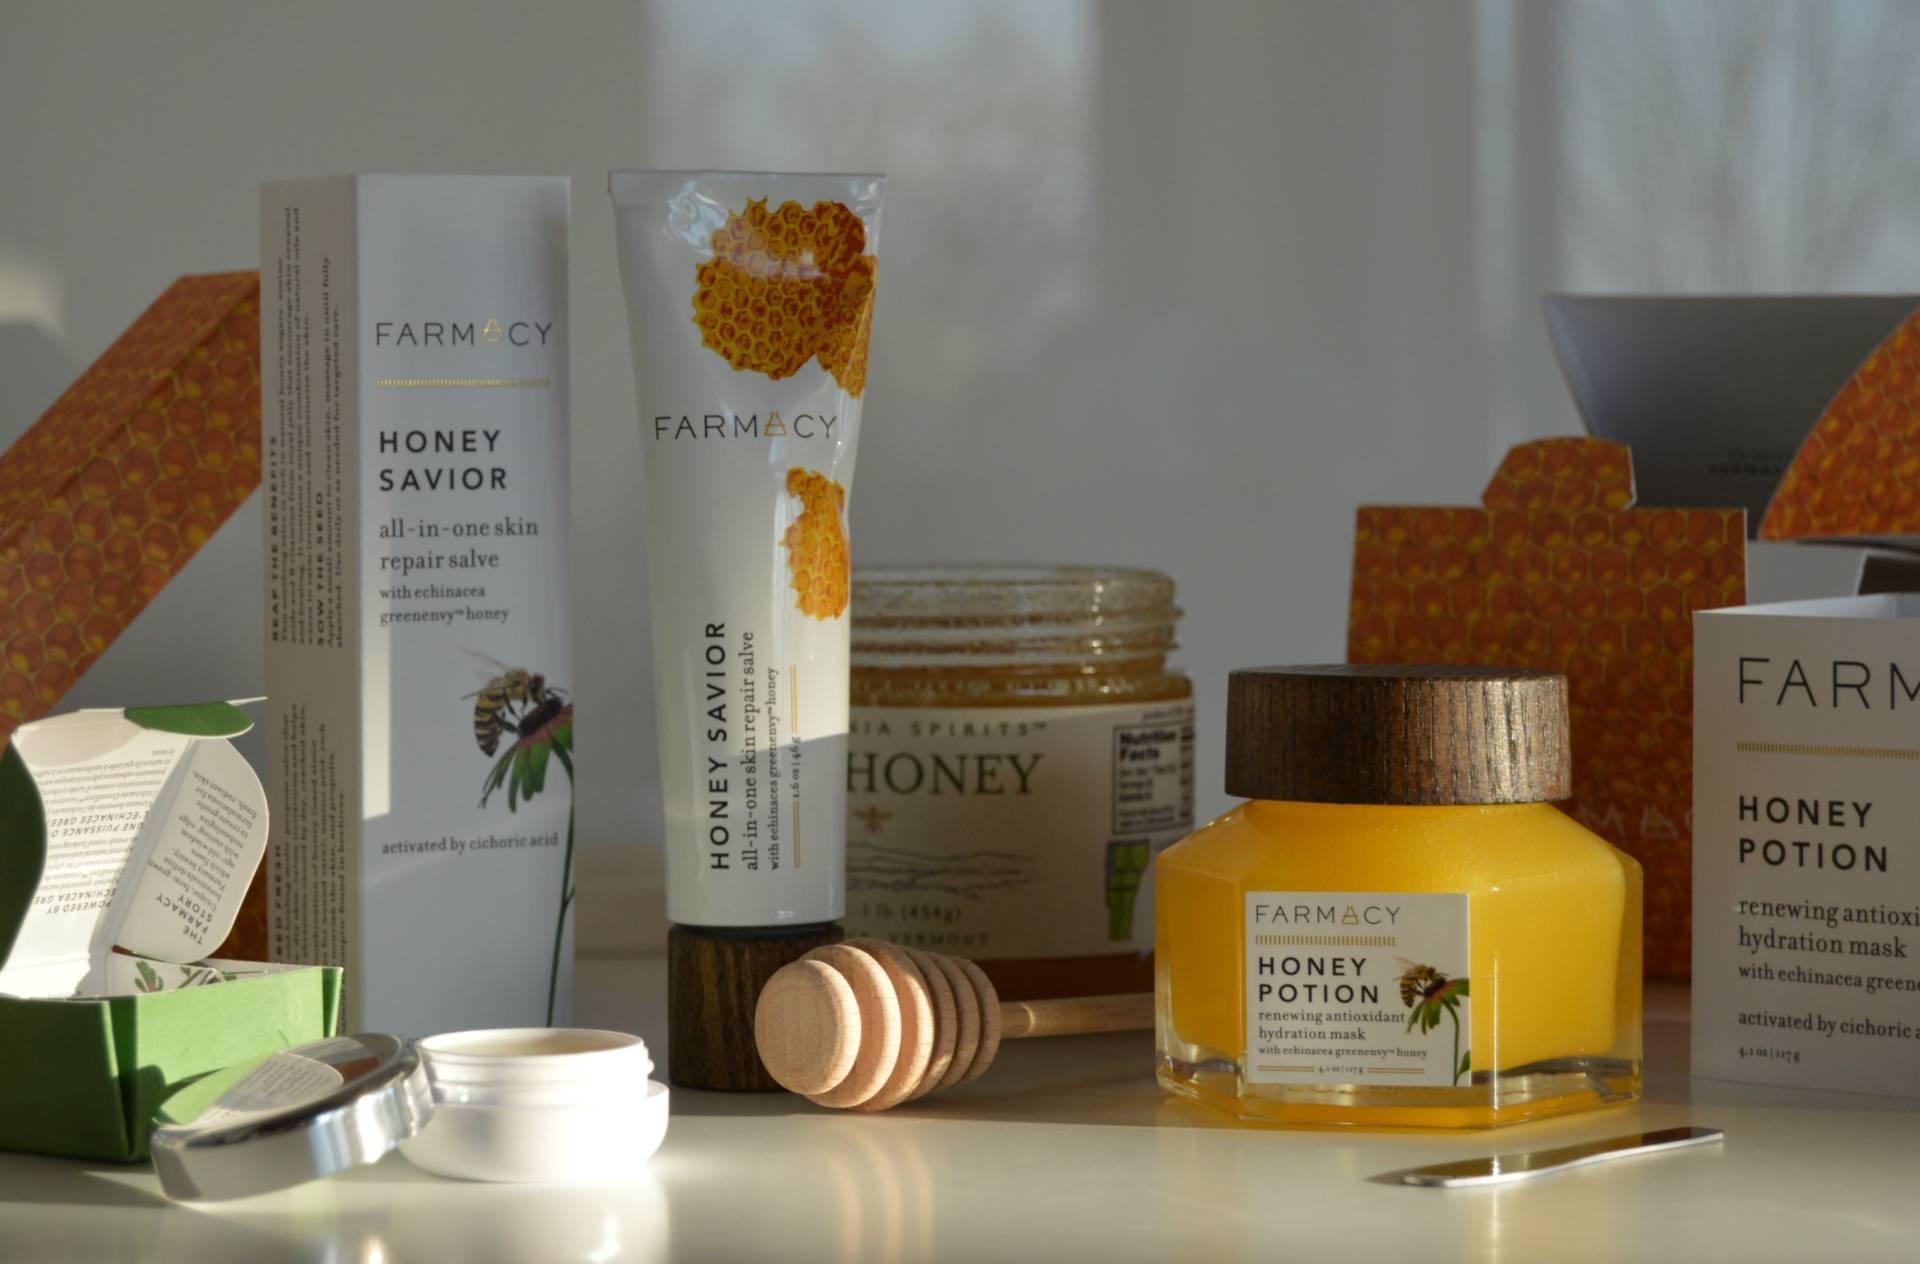 farmacy-honey-potion-savior-review-inhautepursuit